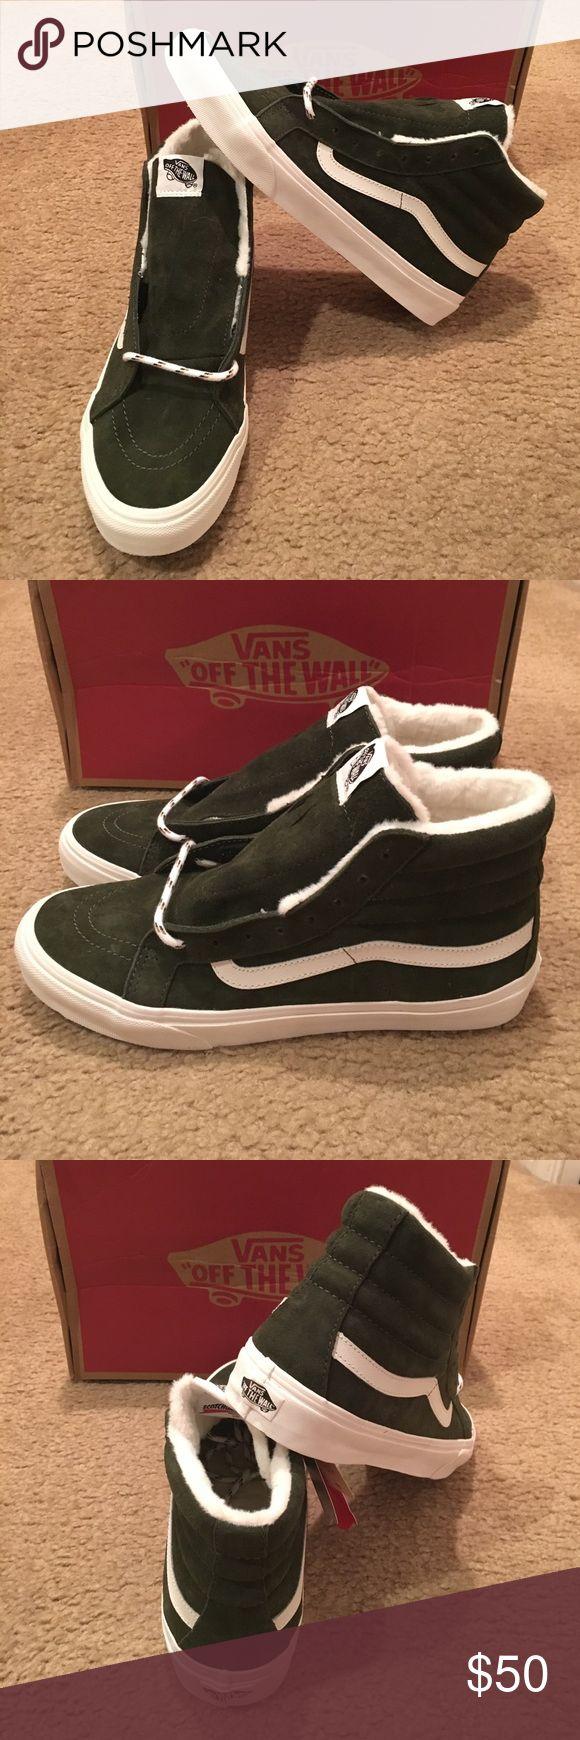 Vans Scotchgard Sk8Hi Slim New in box. Duffel bag/ Blanc de blanc Vans Shoes Sneakers